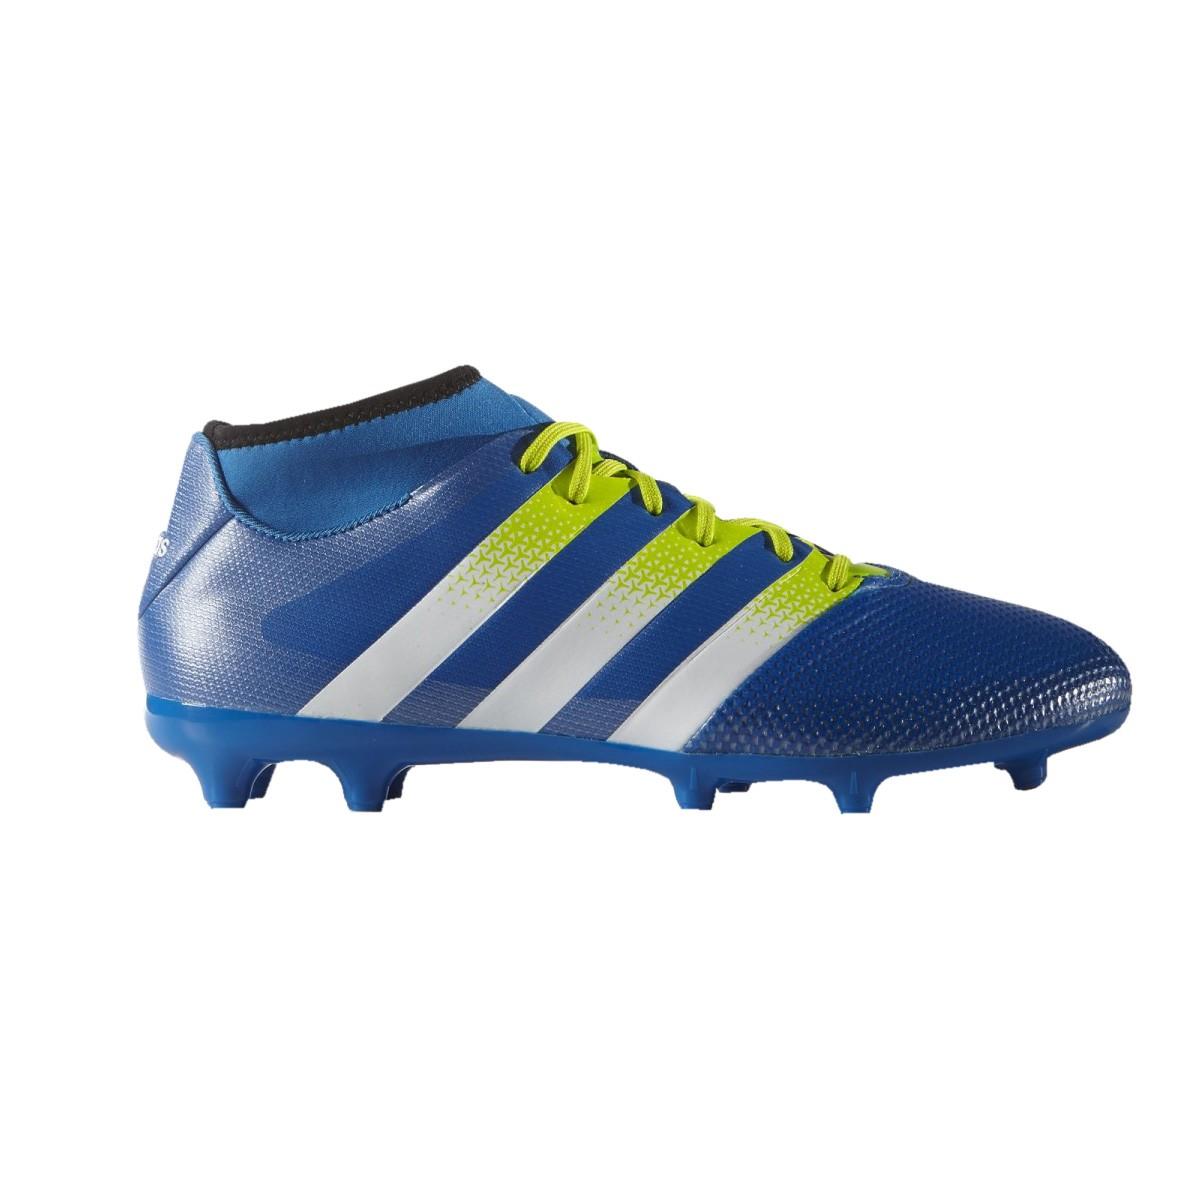 Chuteira Campo Adidas Ace 16.3 Primemesh FG AQ2556 Azul Branco 0bcfd8d60491f